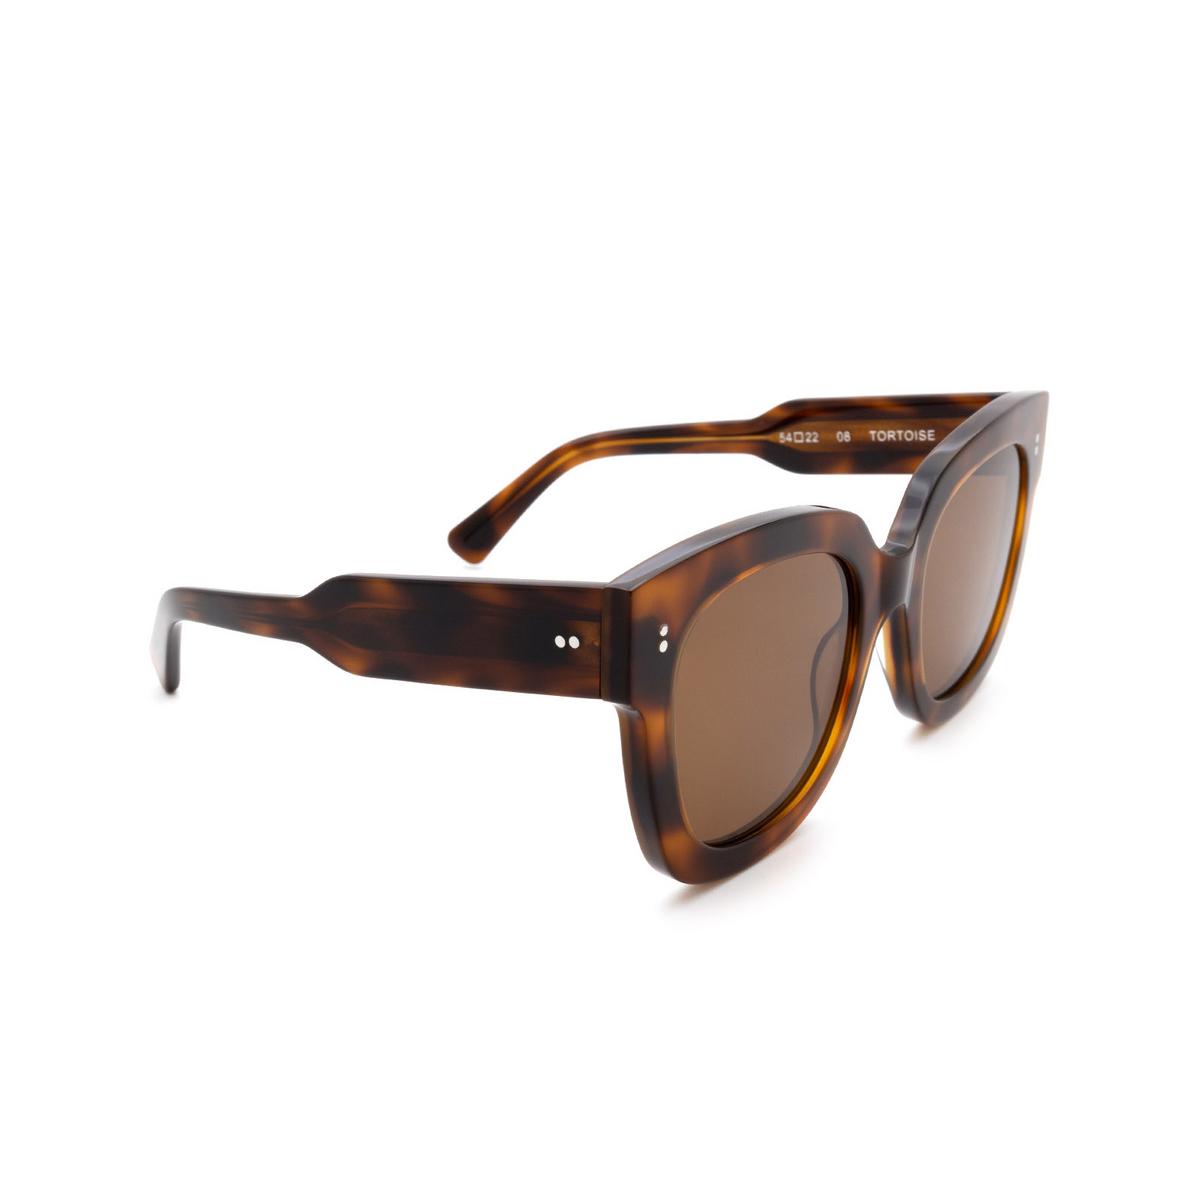 Chimi® Square Sunglasses: 08 color Tortoise - three-quarters view.